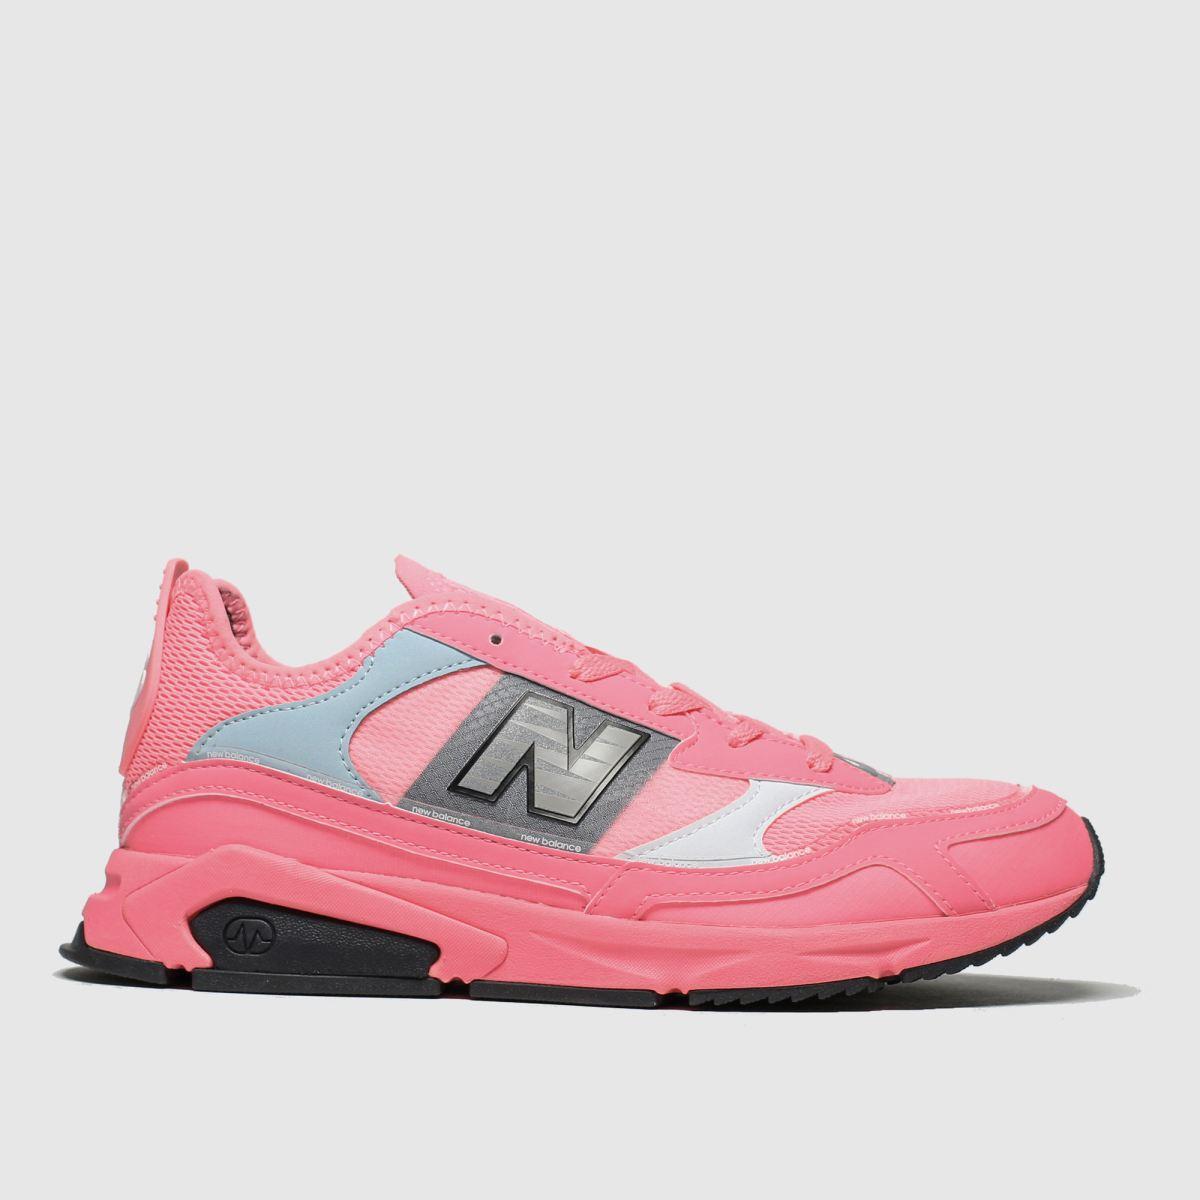 New Balance New Balance Pink Xrc Trainers